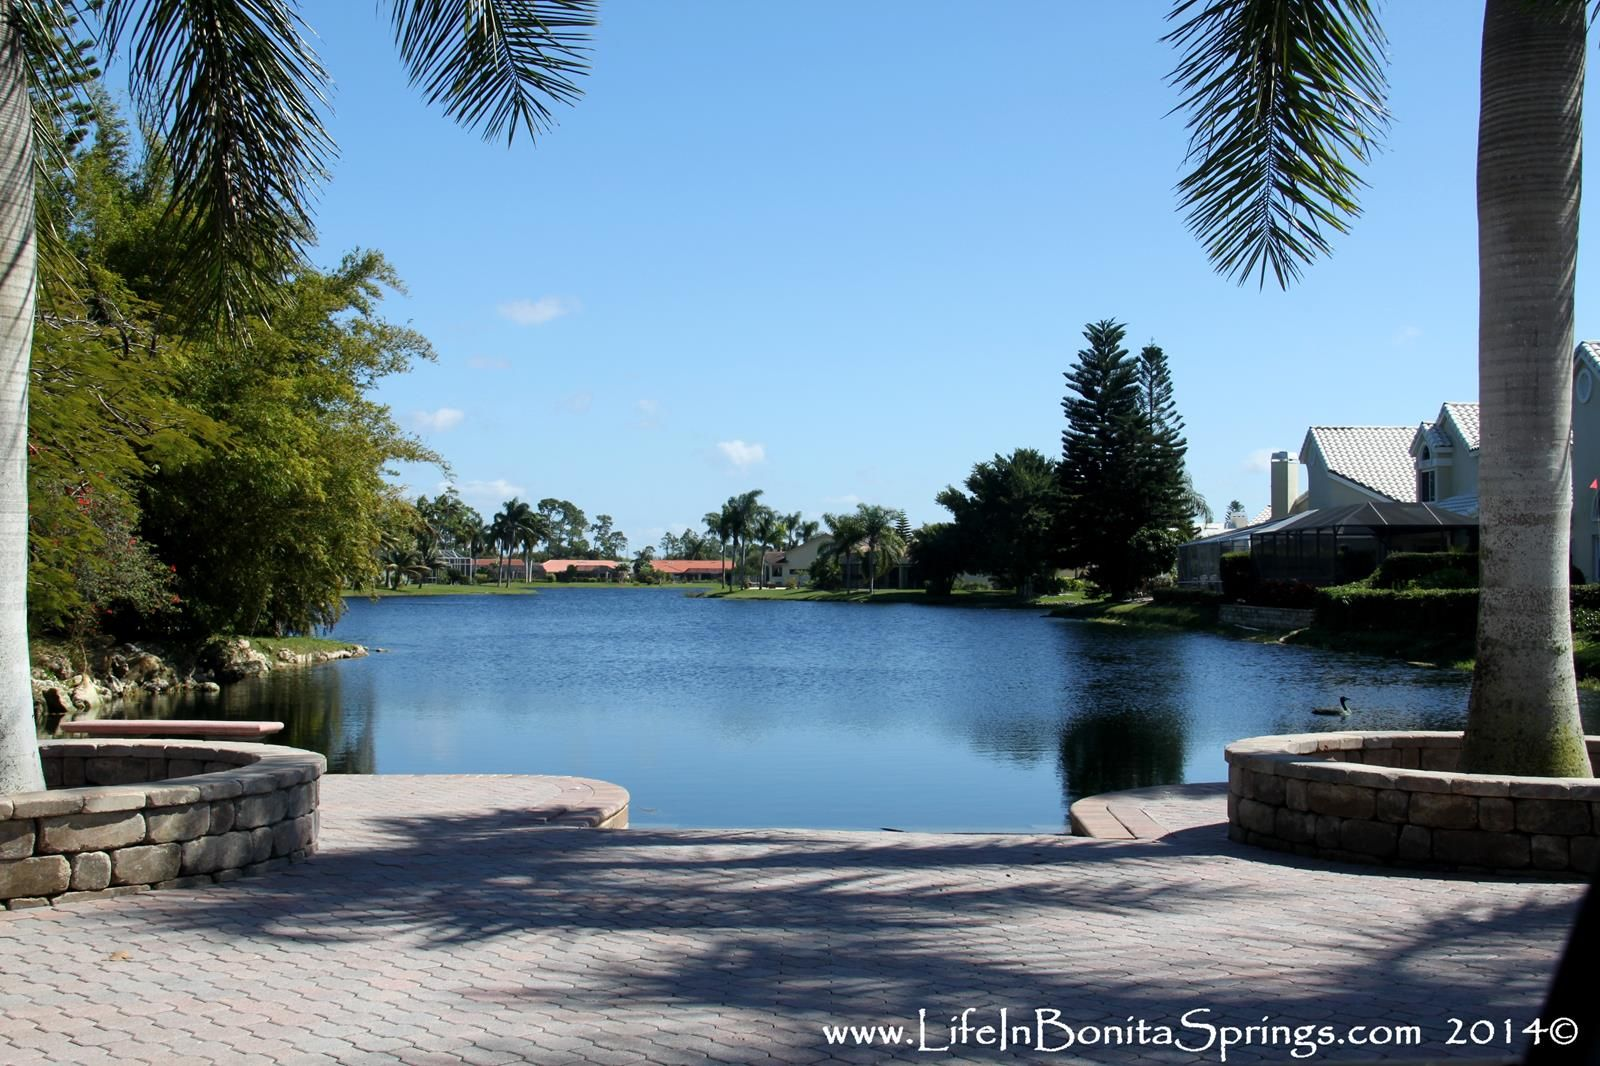 Vanderbilt Lakes21 - OneDrive